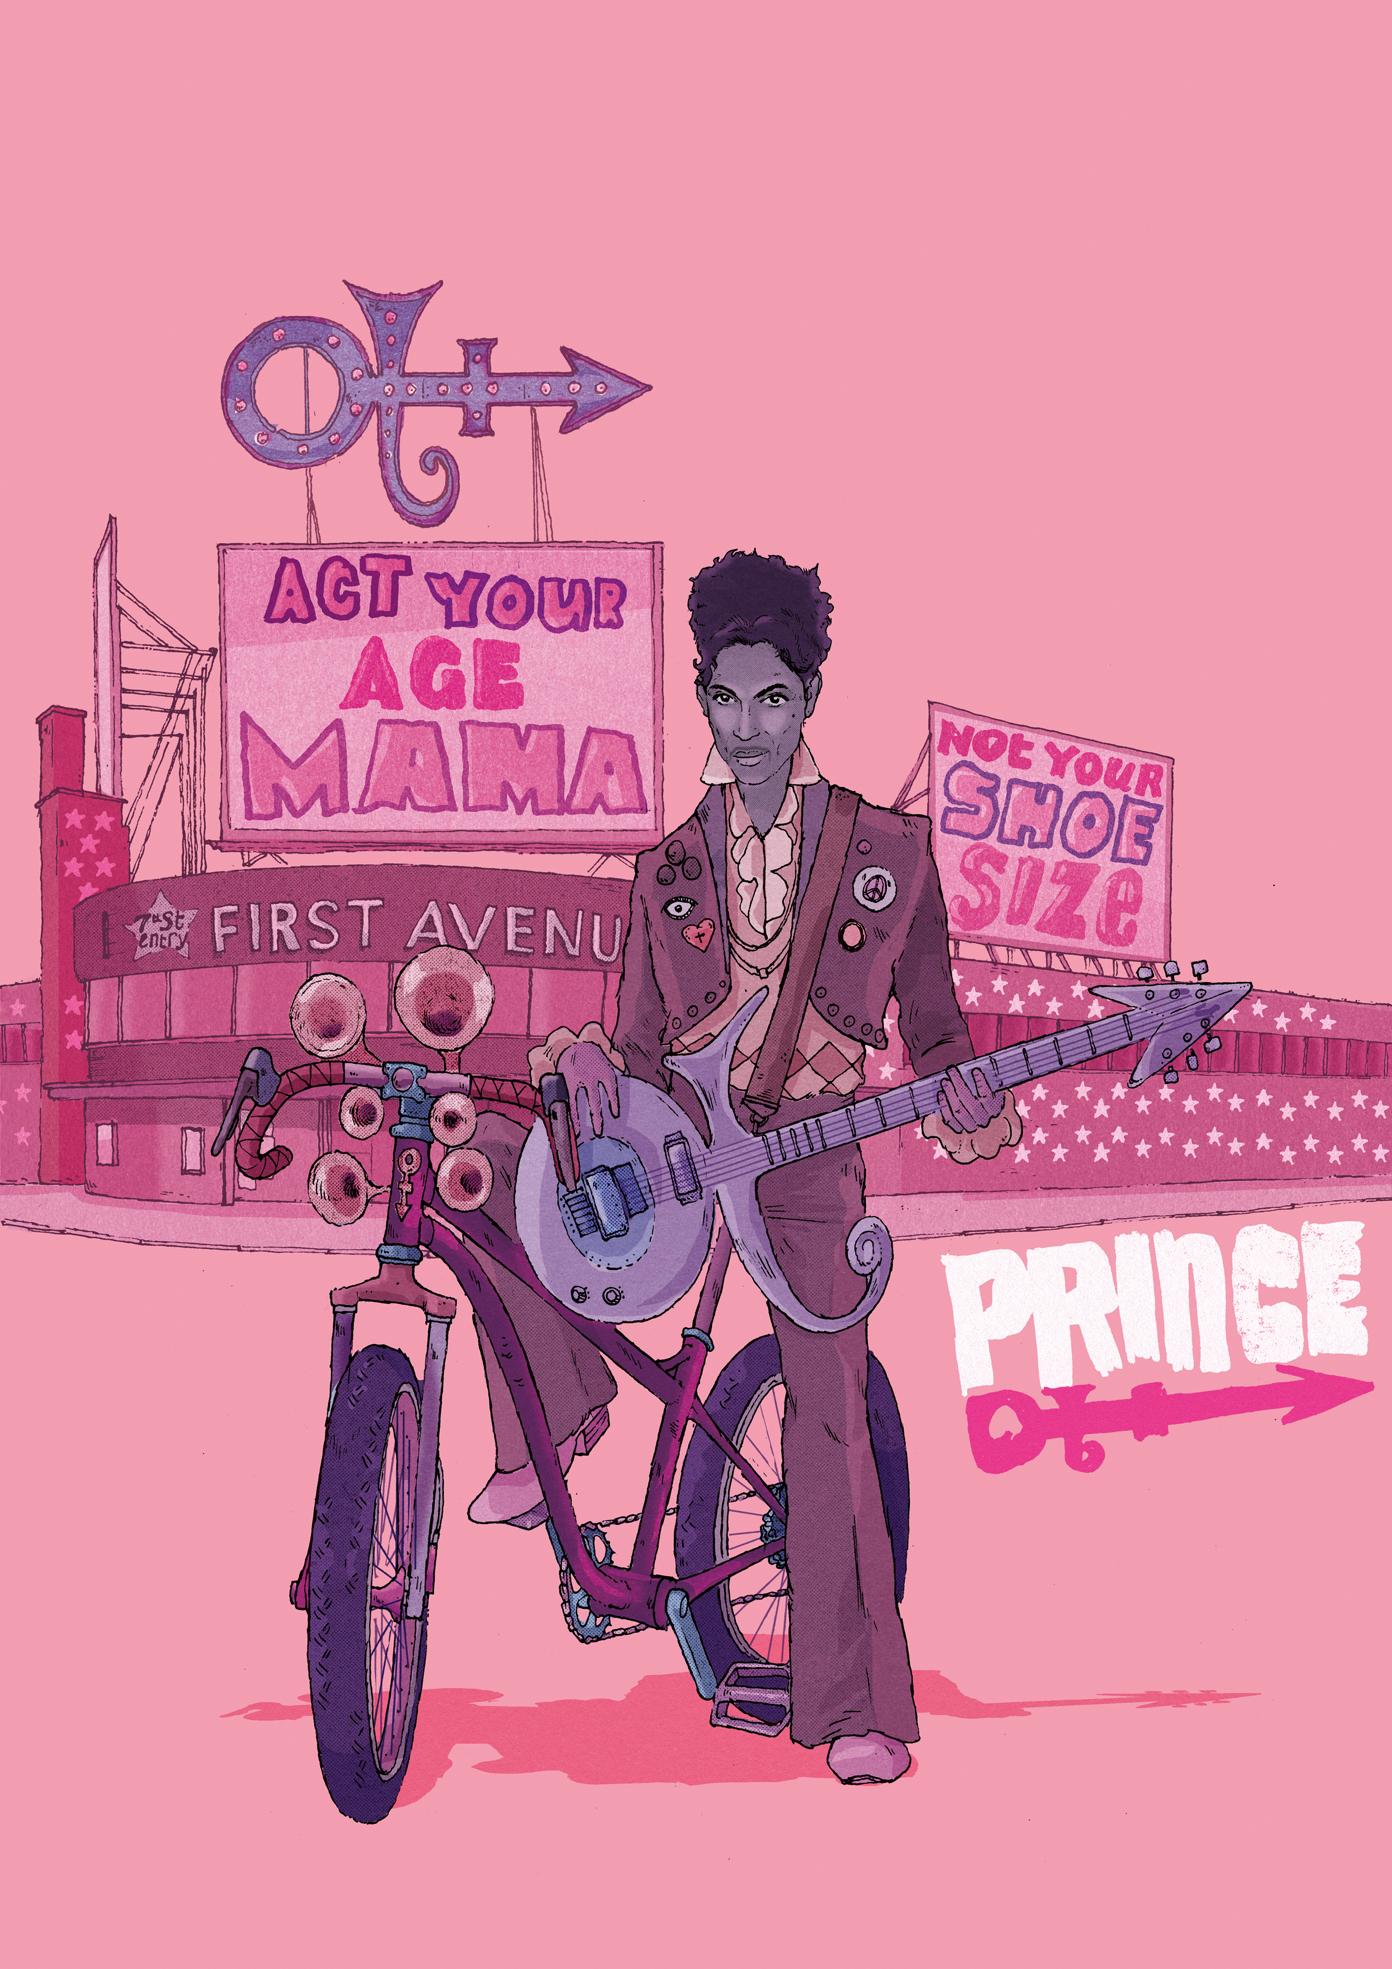 Prince-big.jpg